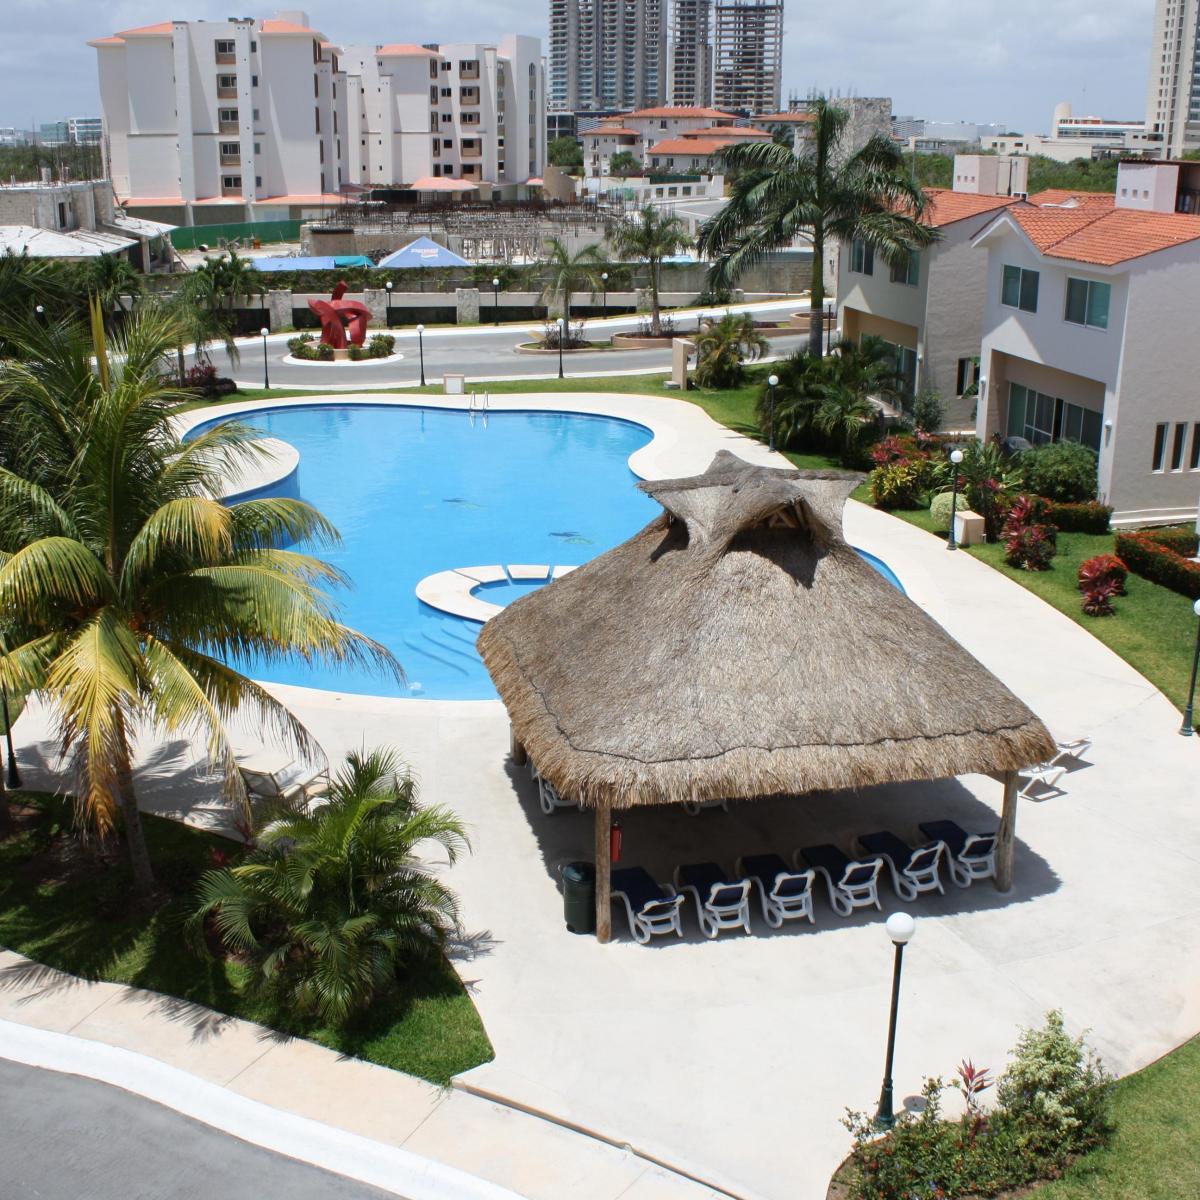 Depto en Venta Cancun Excelente zona, seguridad, alberca